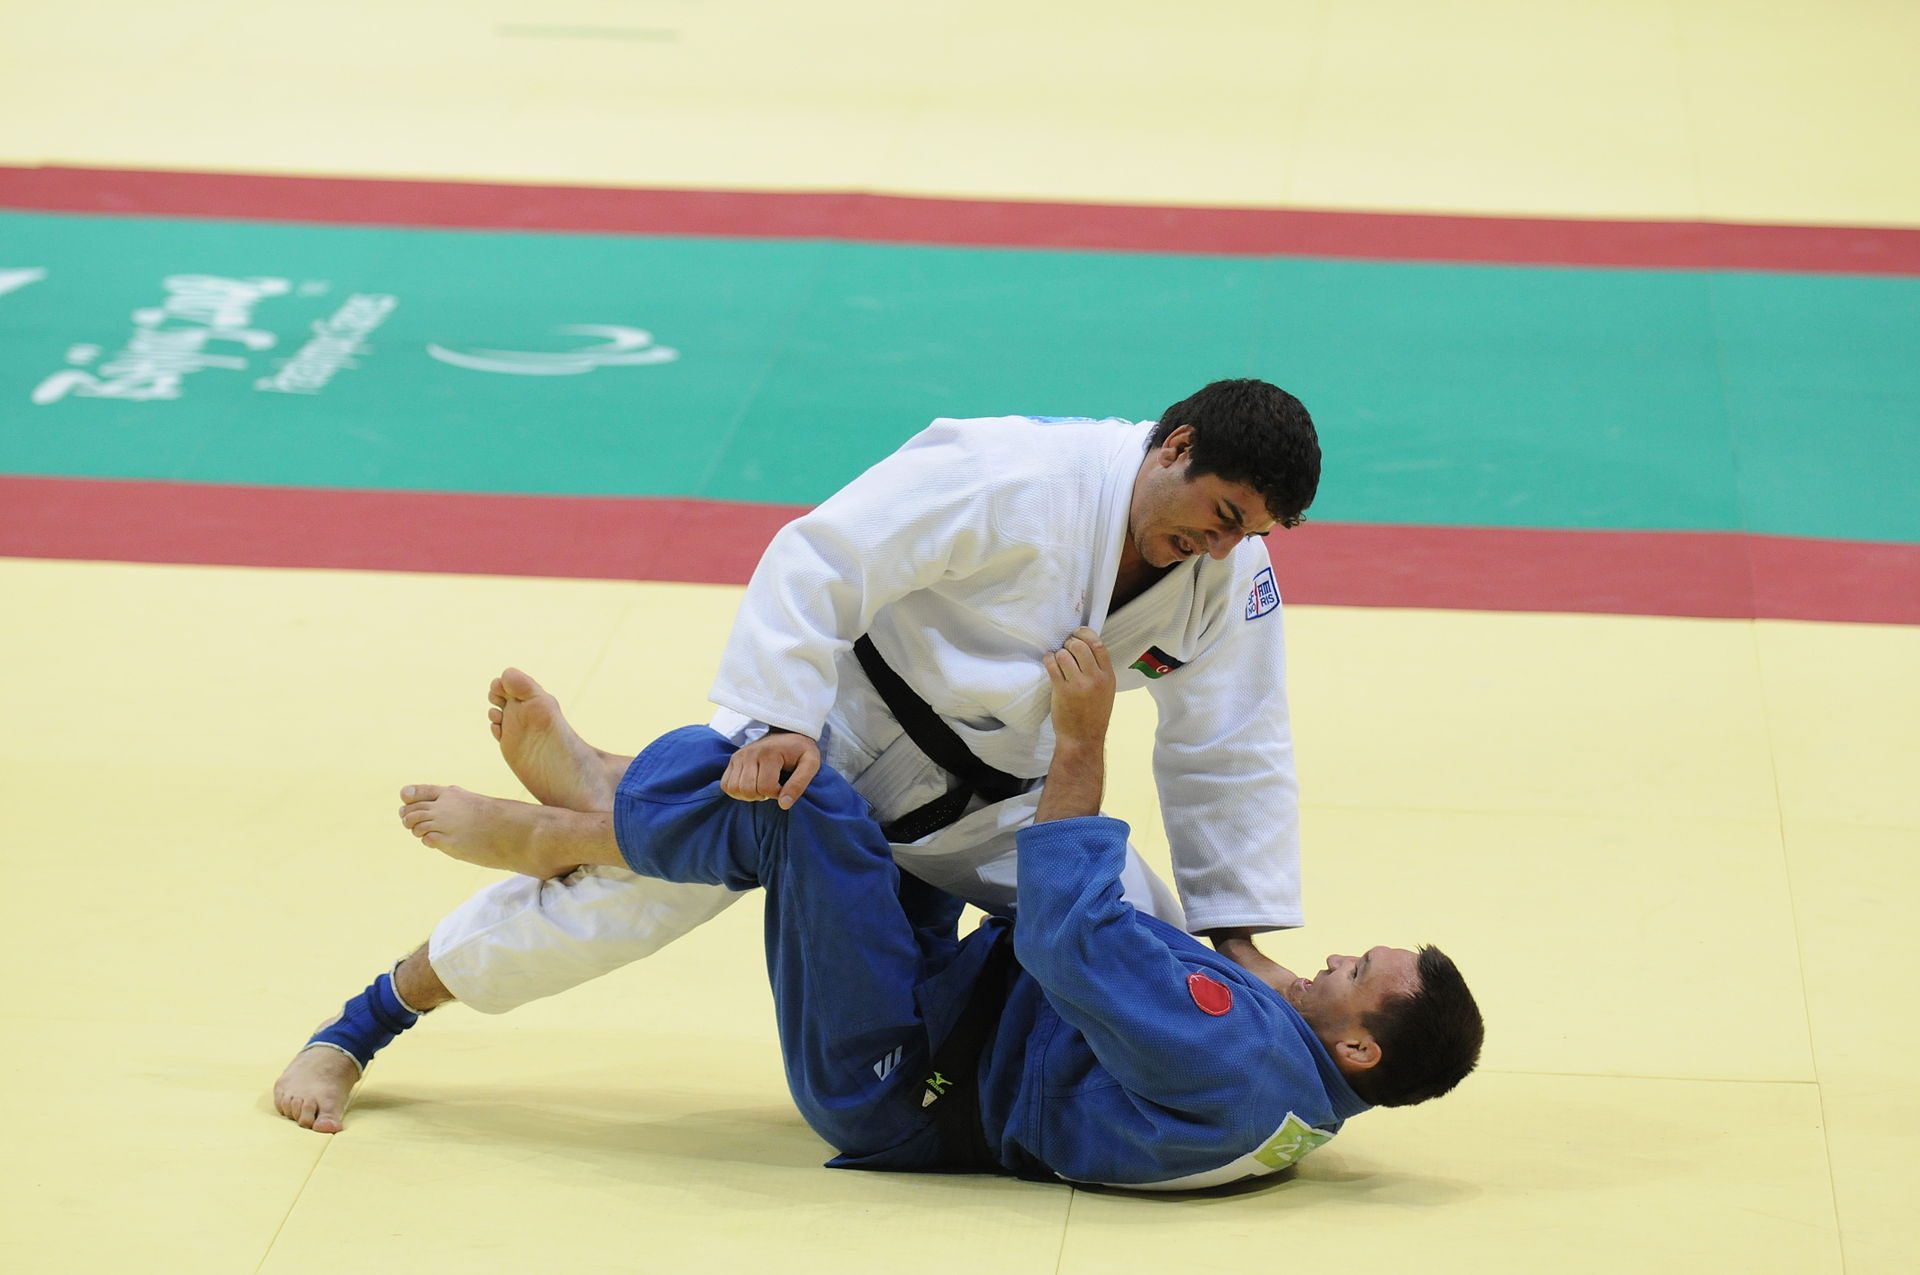 Judo at the 2008 Summer Paralympics - Men's 90 kg - Wikipedia